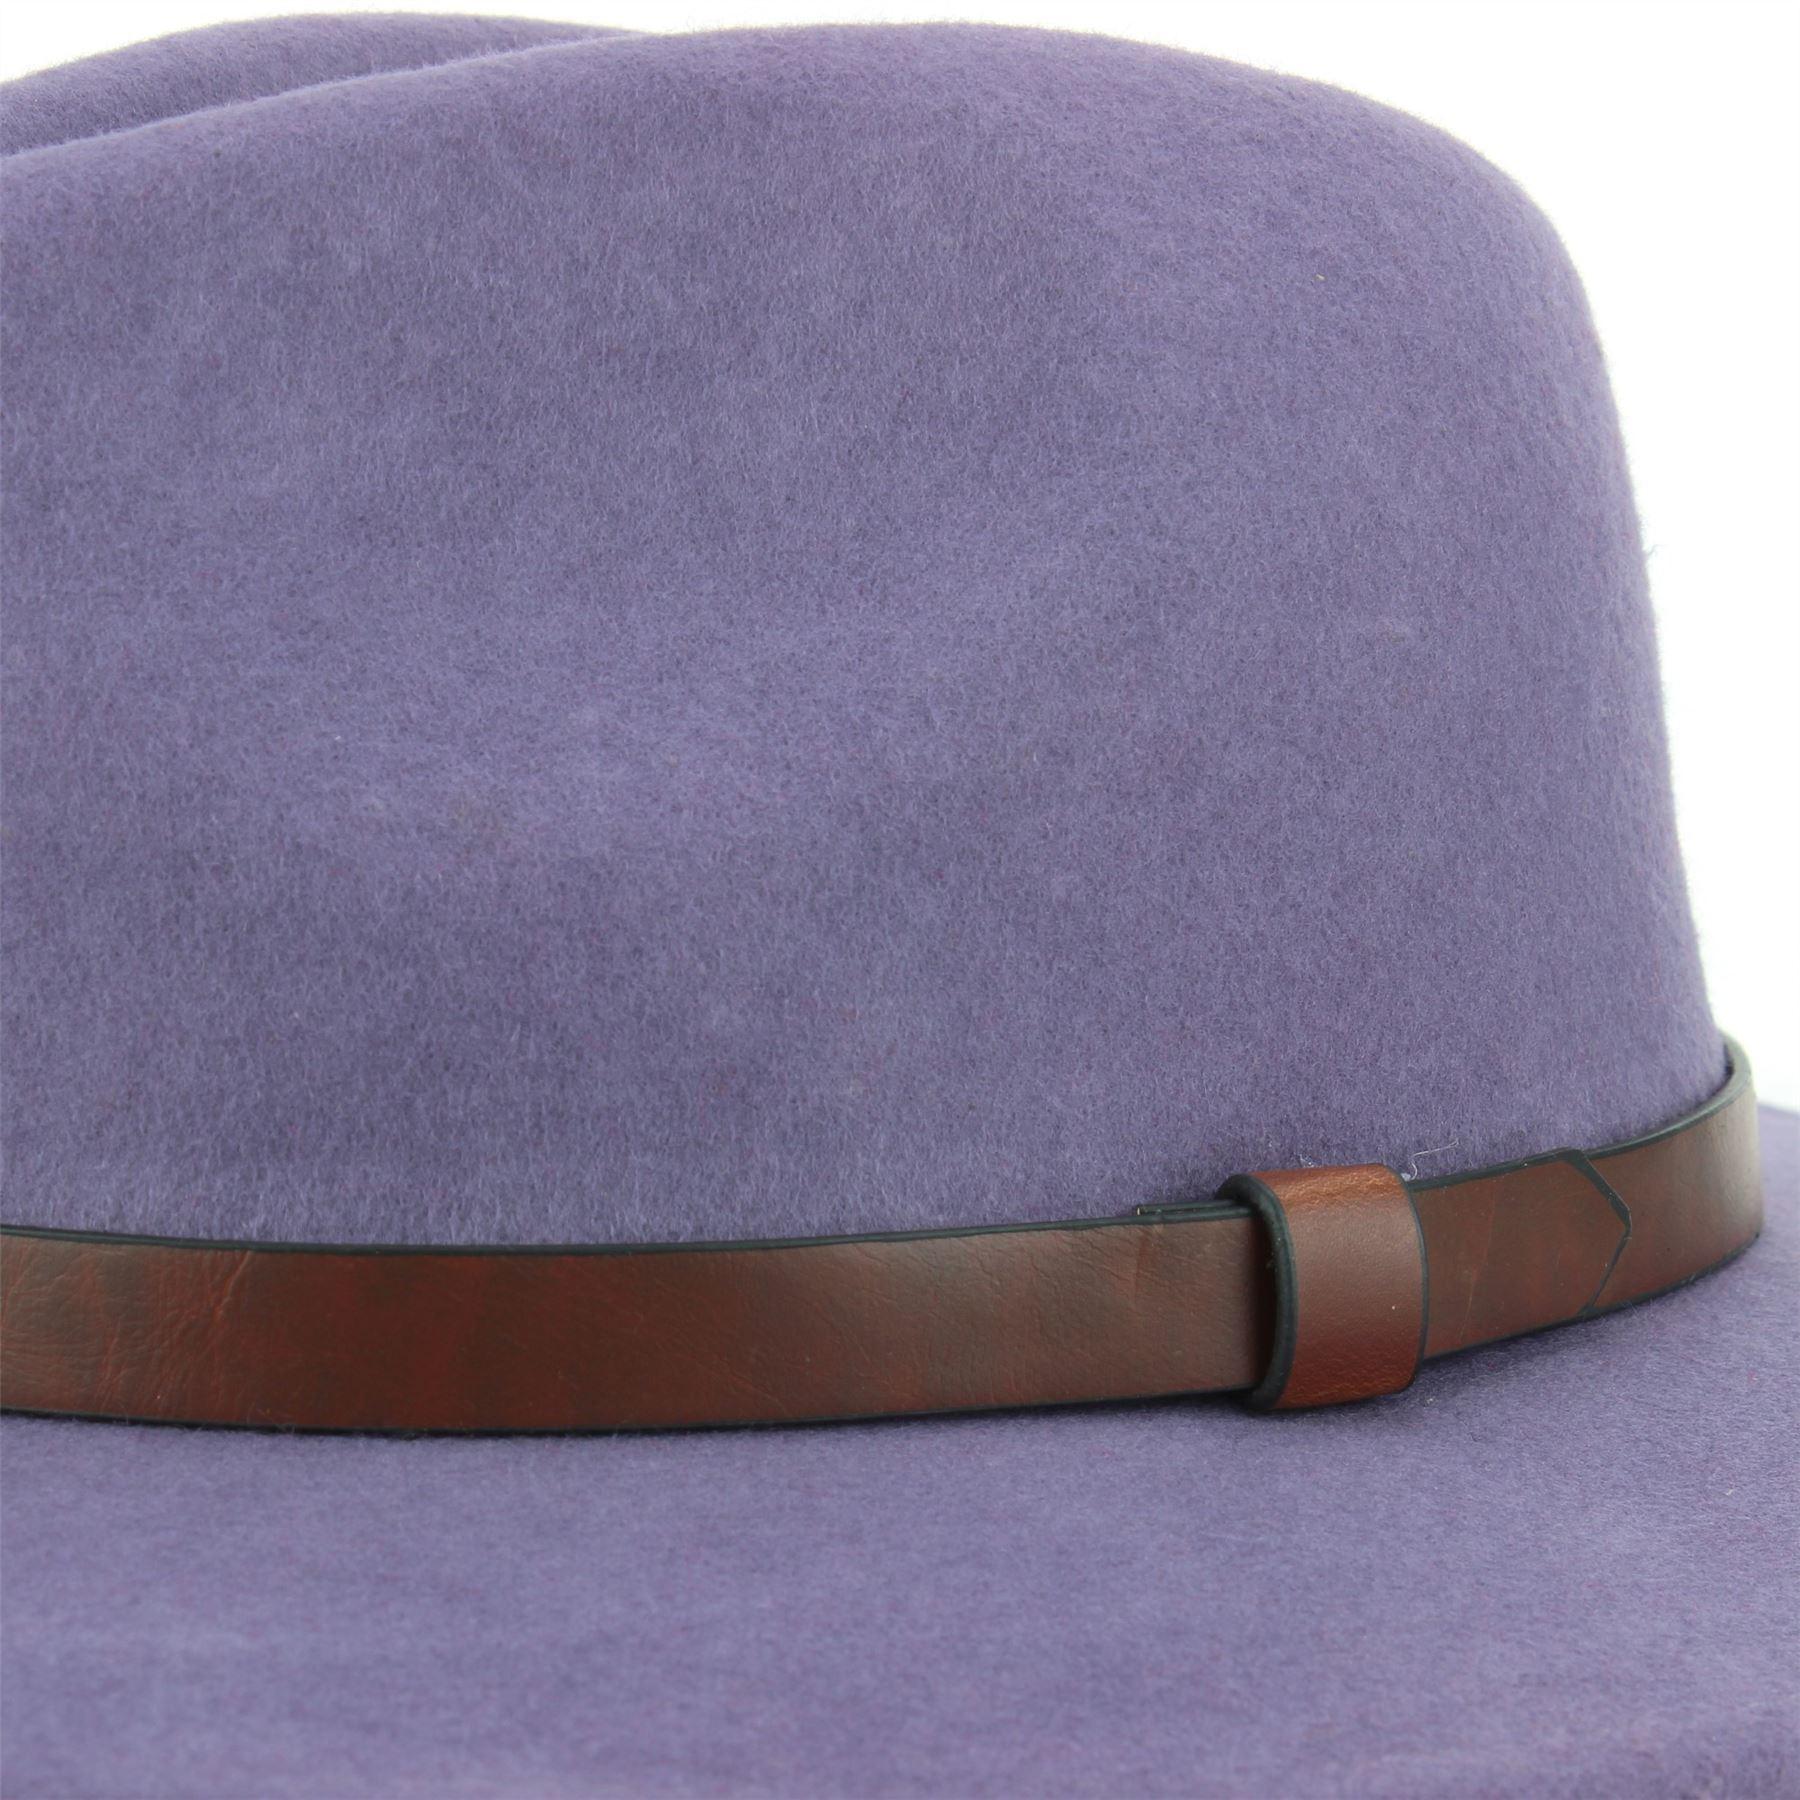 Fedora-Hat-Wool-Felt-Hawkins-Feather-Band-Trilby-Ladies-Men-Travel-Brim-Travel thumbnail 9